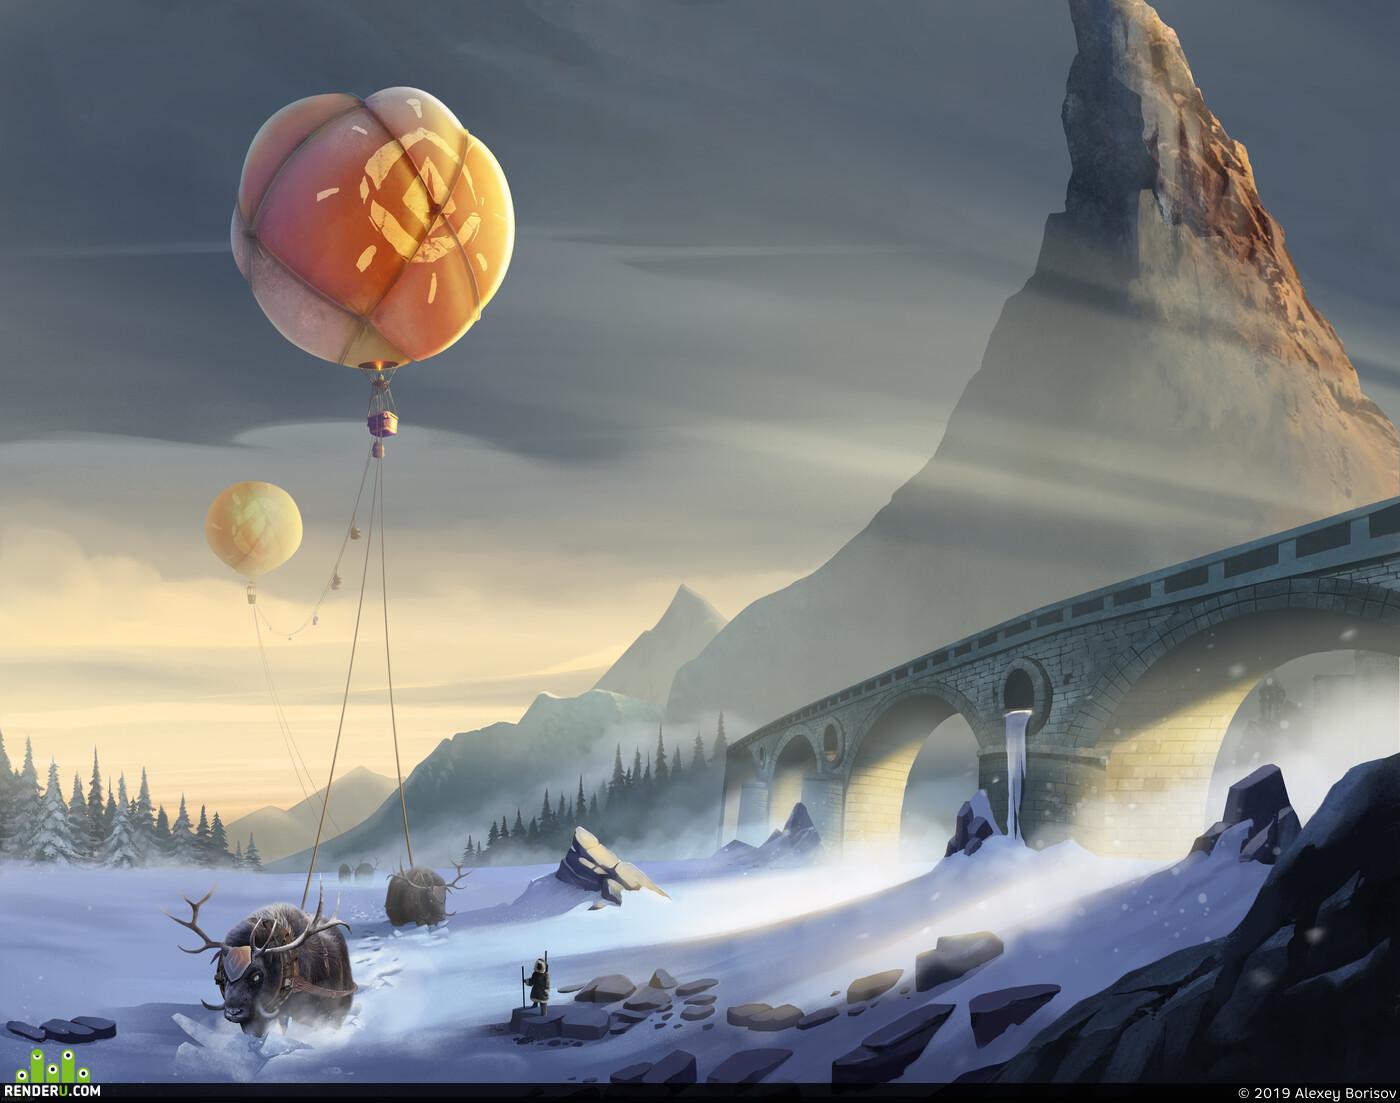 baloon, iceworld, mountain, постапокалипсис, мороз, Караван, осколкистарогомира, закат, север, north